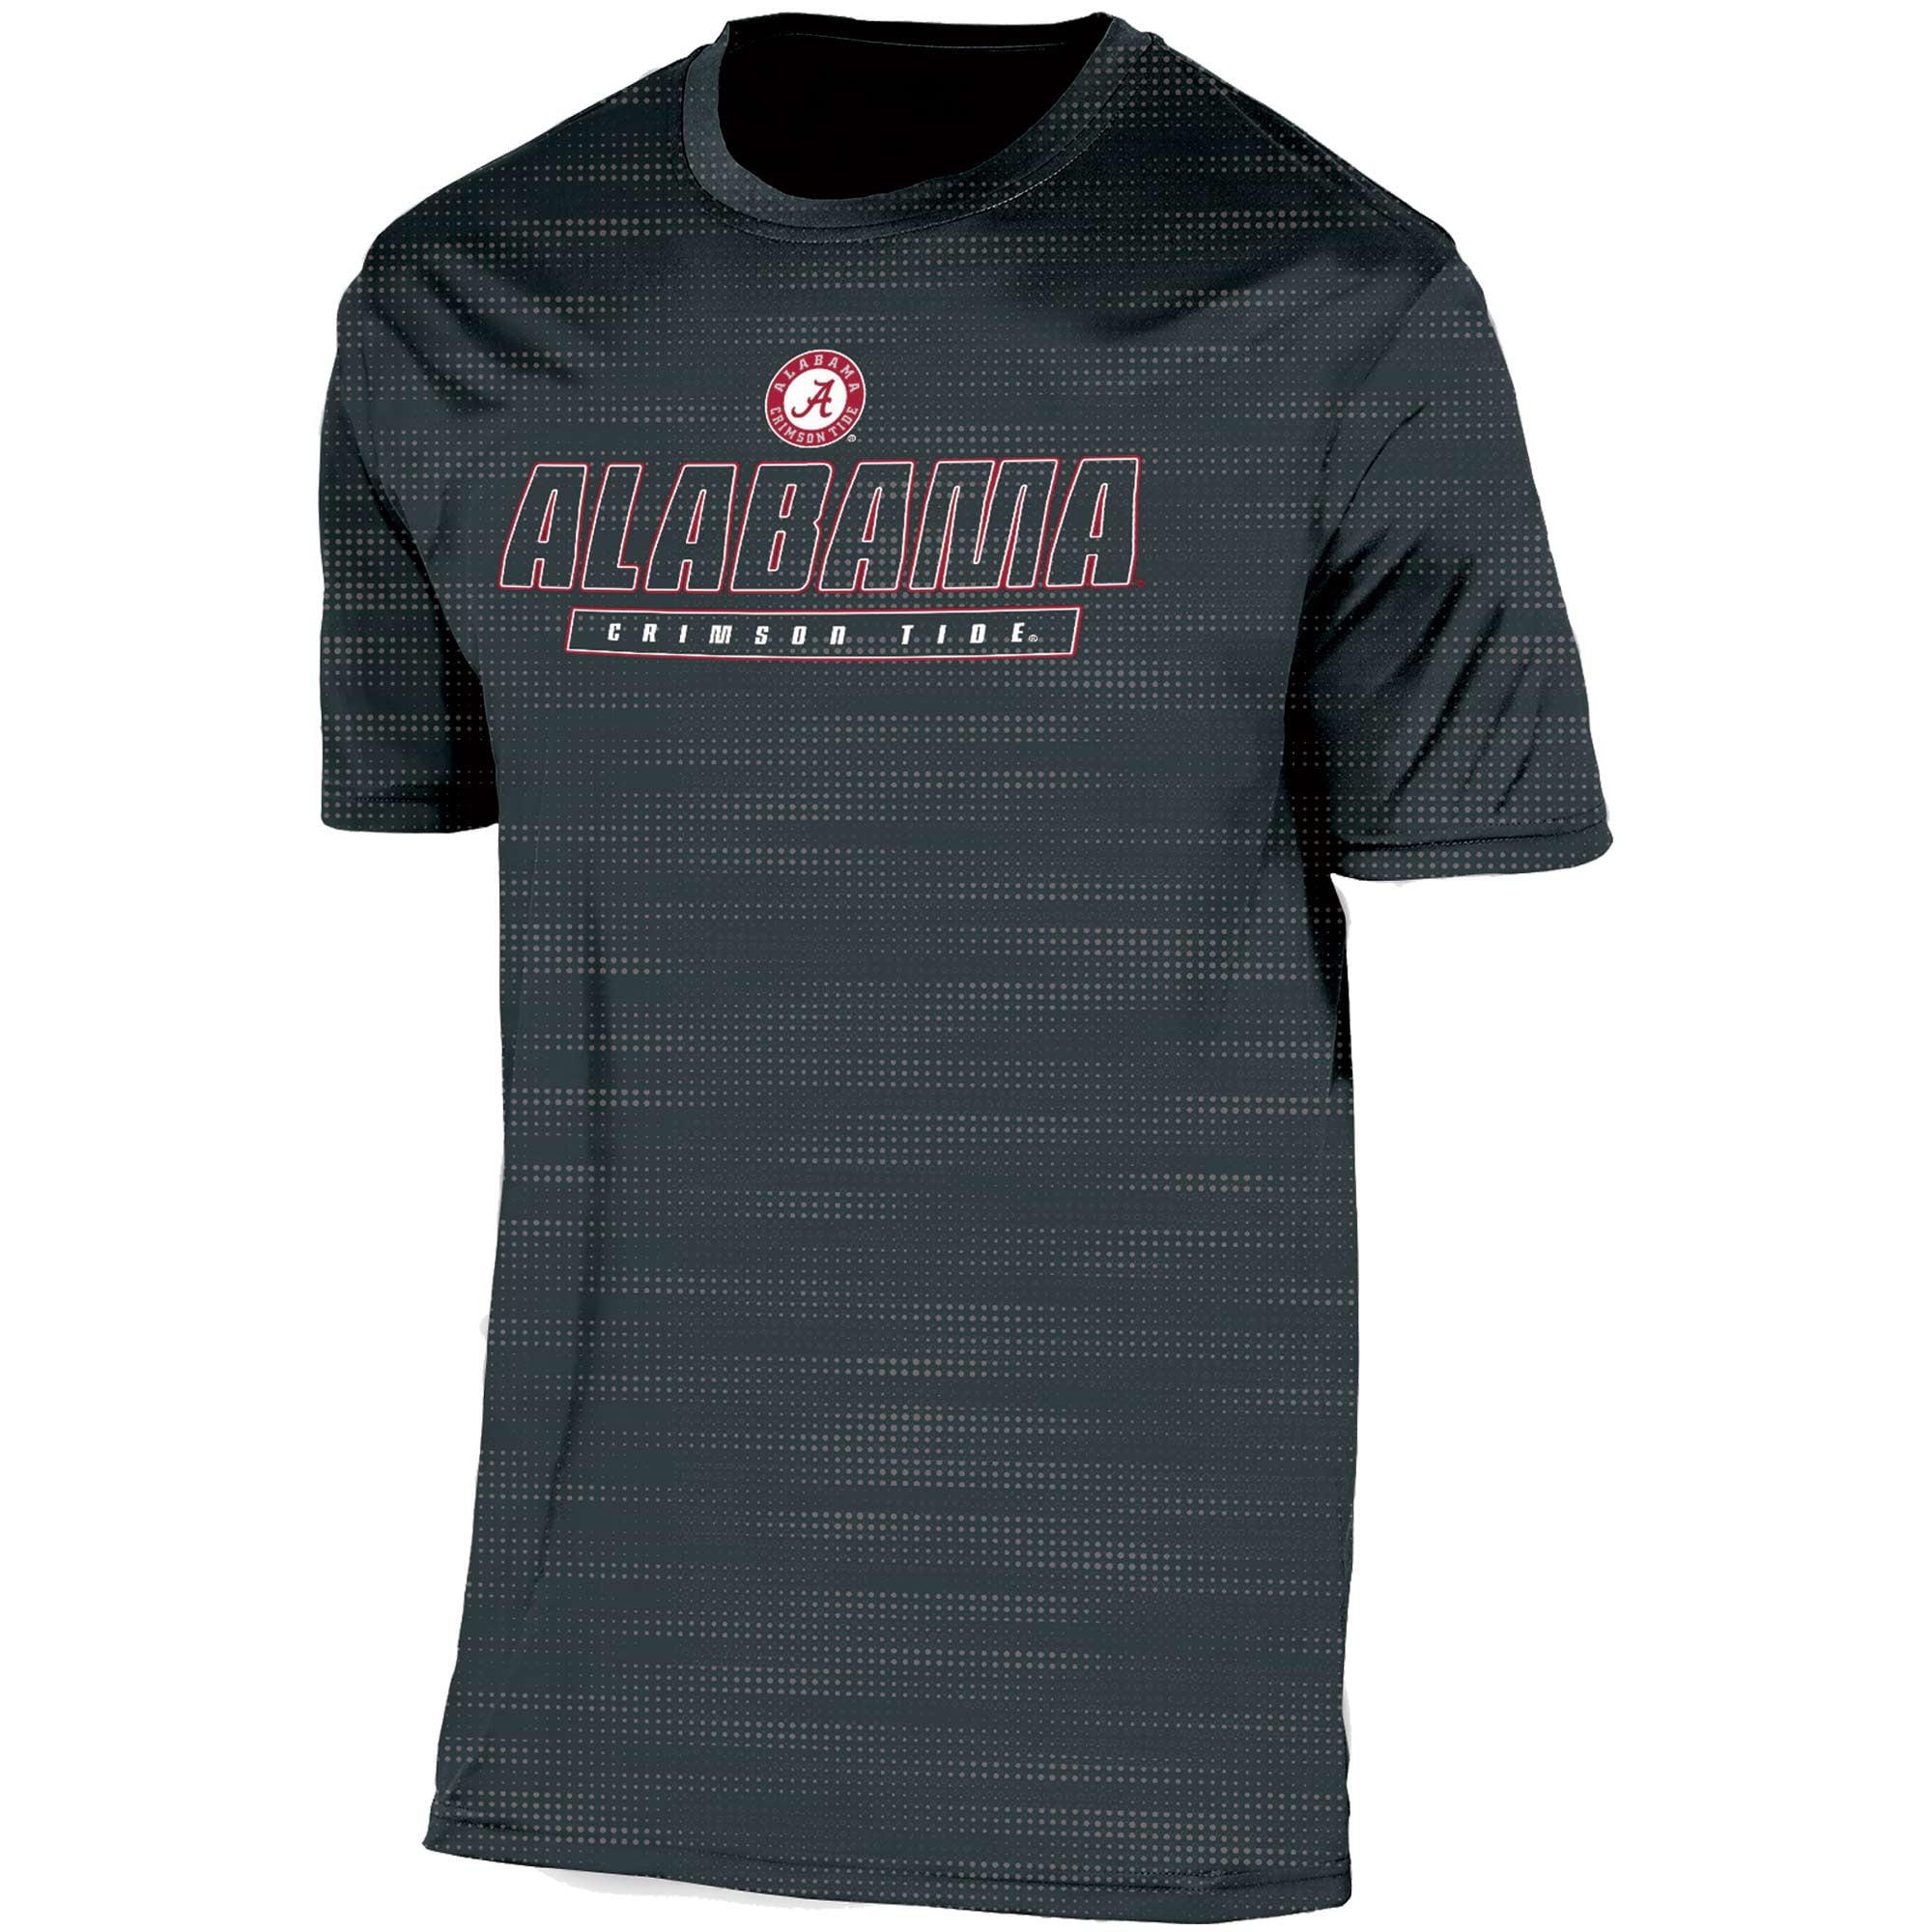 Men's Russell Black Alabama Crimson Tide Embossed Synthetic T-Shirt